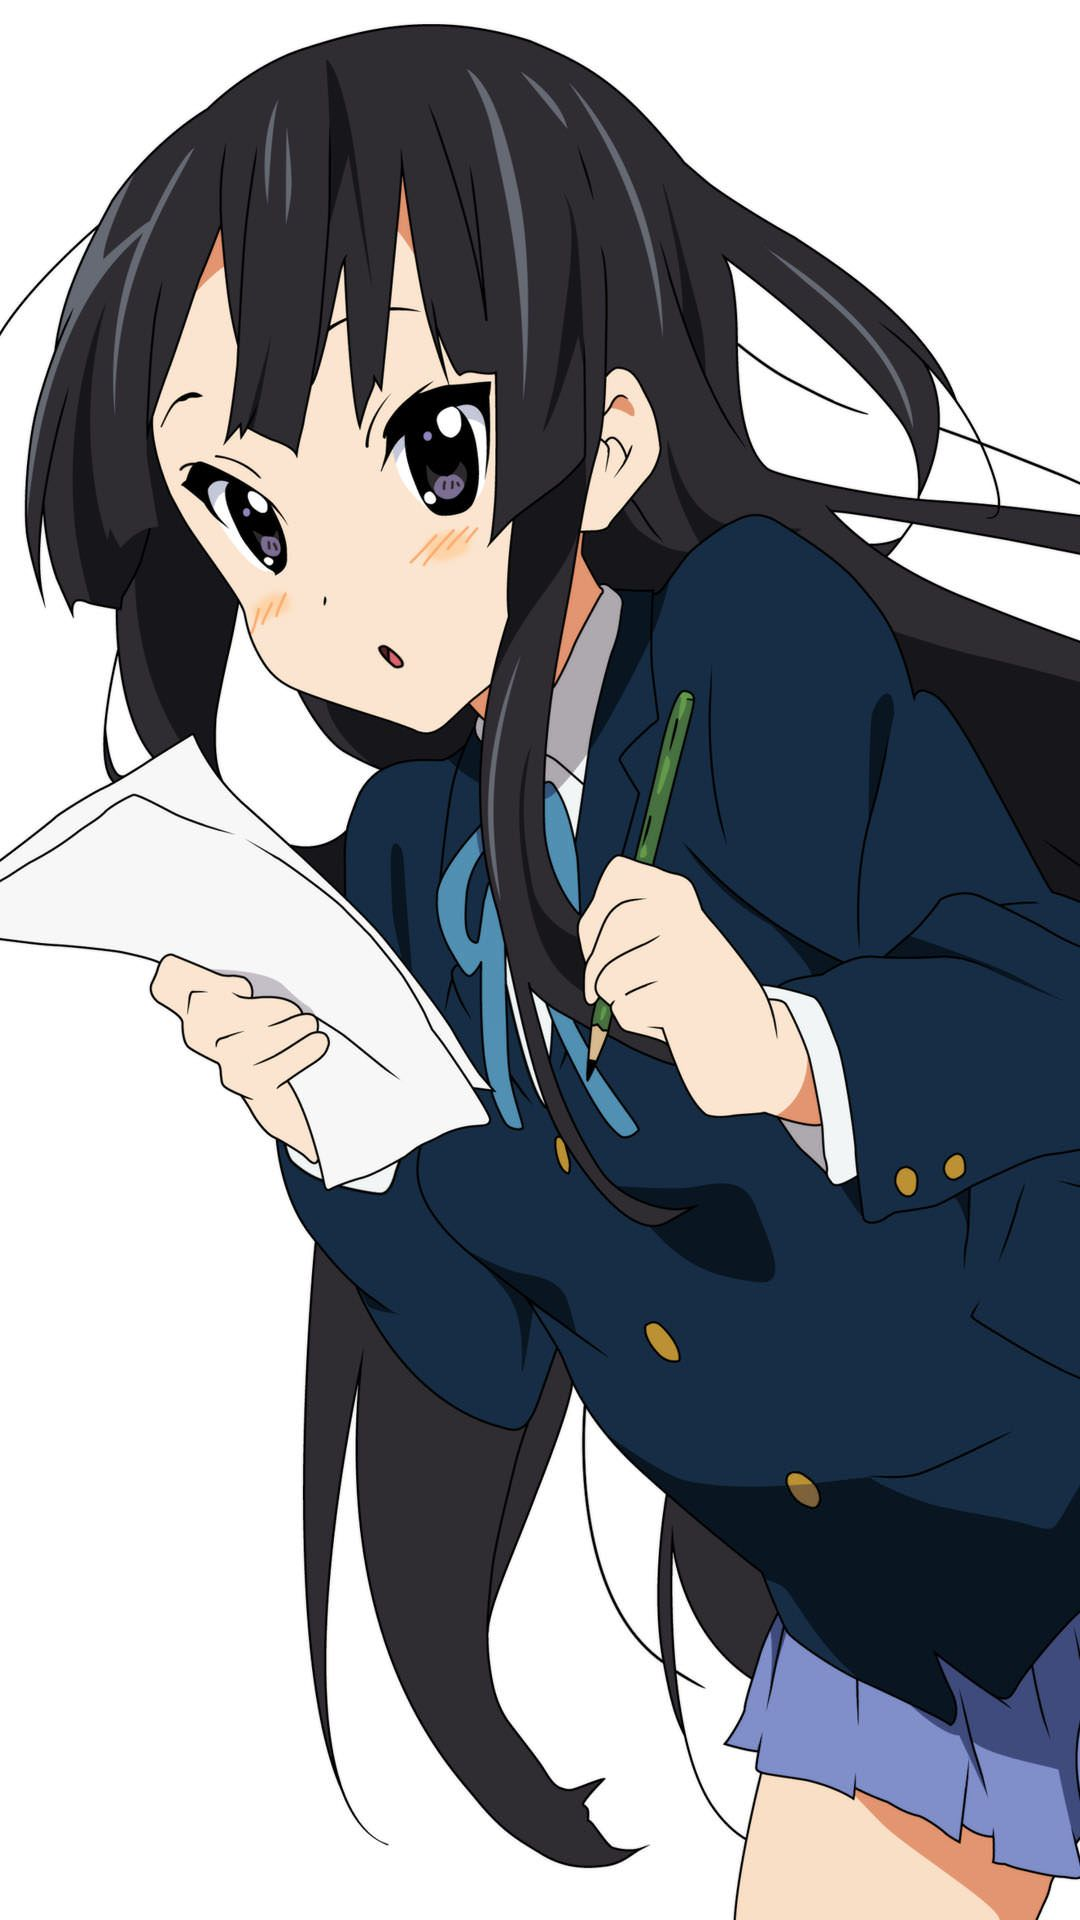 Pin by senjougahara hitagay on Anime/Manga Cute anime